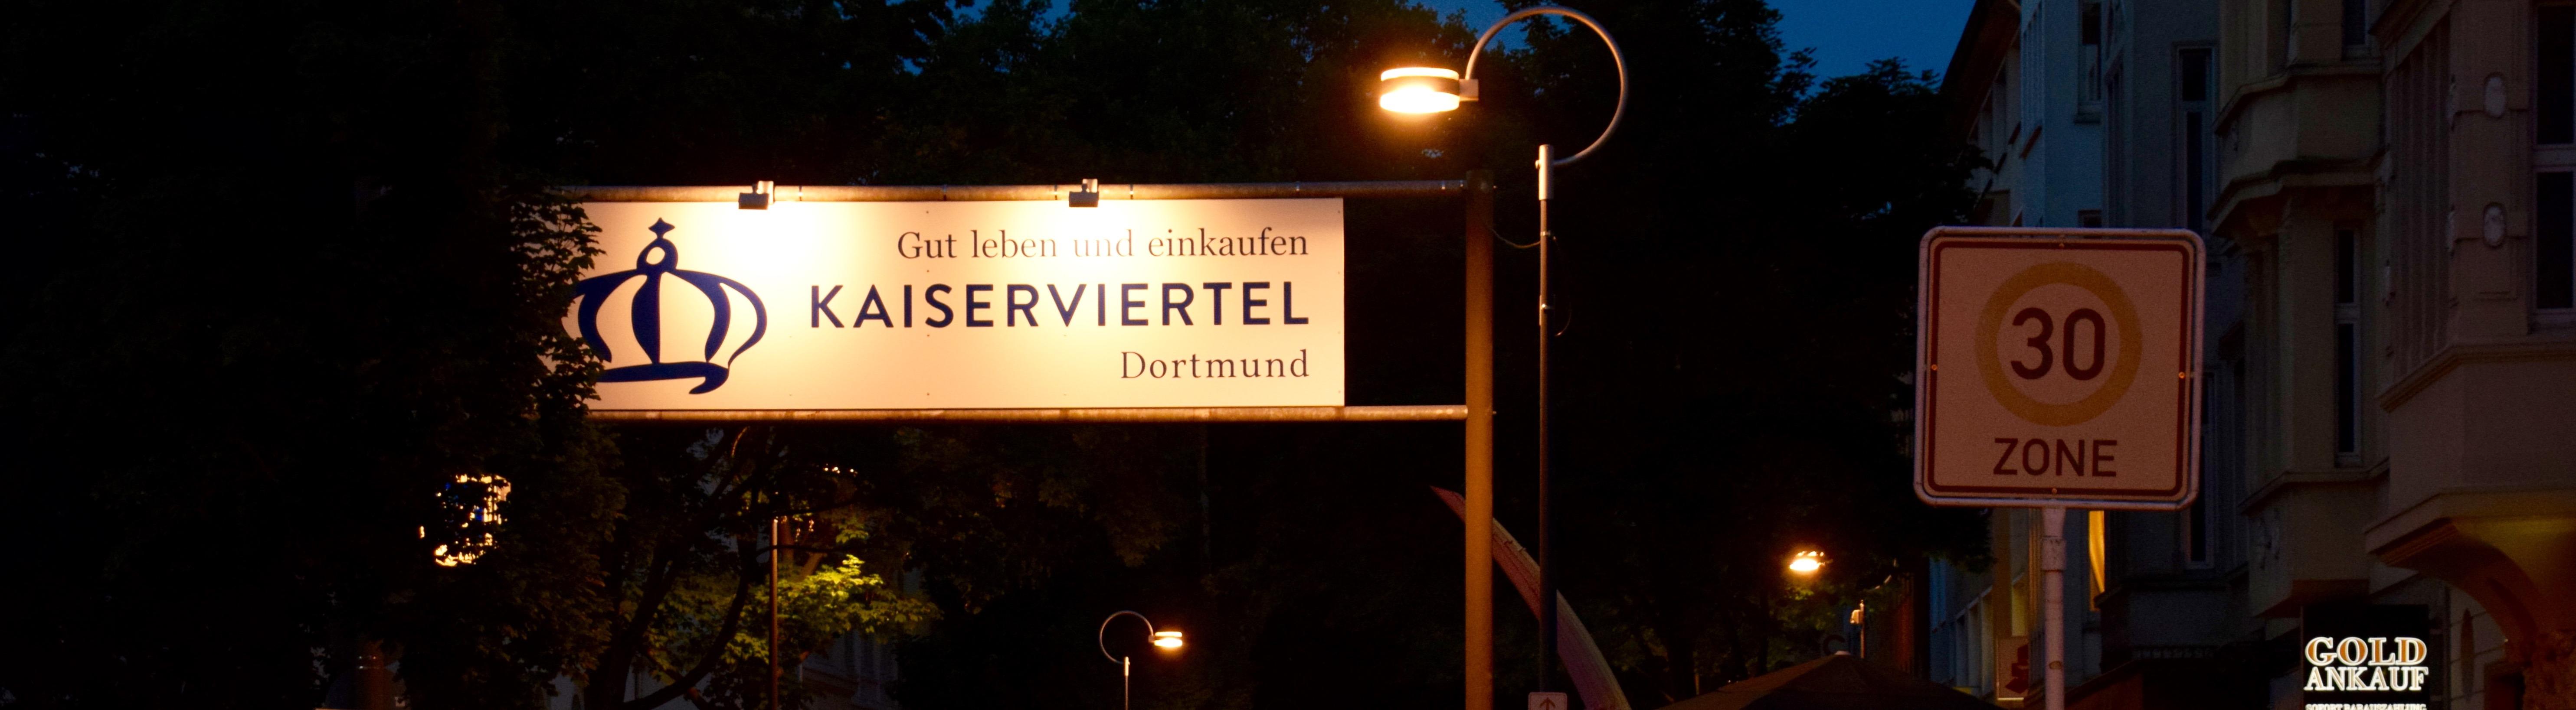 Dortmund Kaiserviertel ©mhu